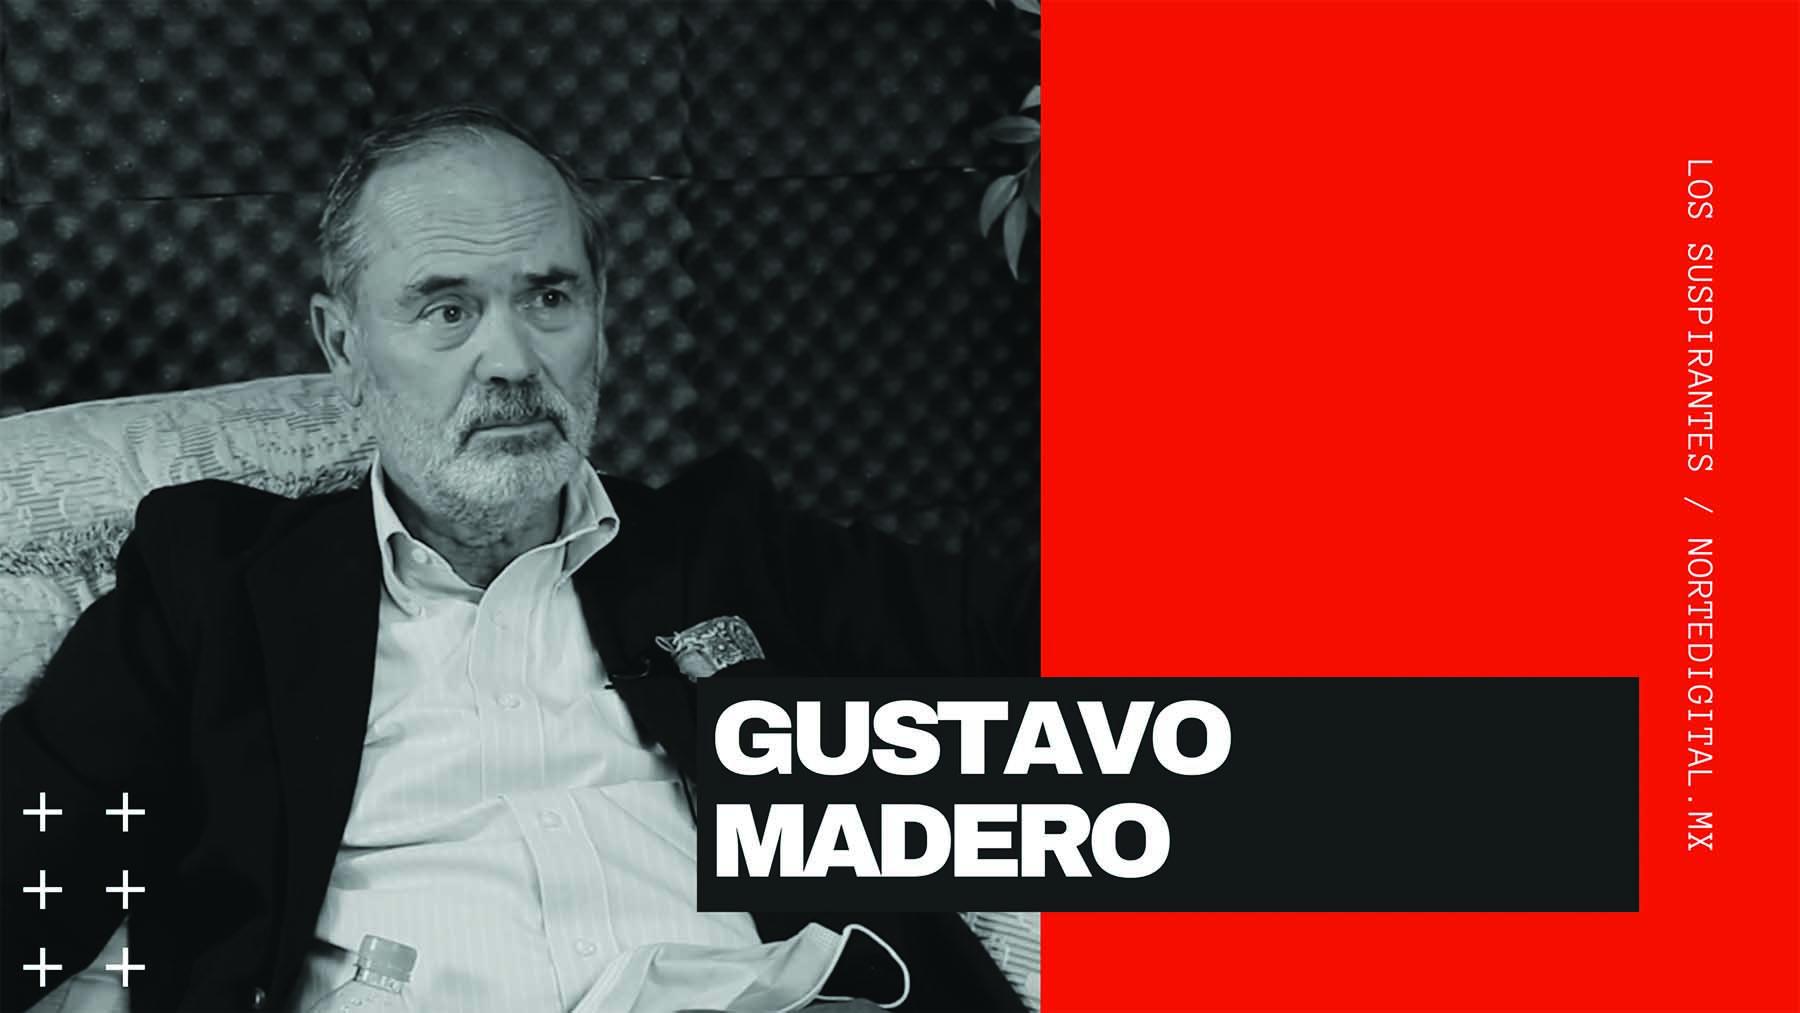 Gustavo Madero